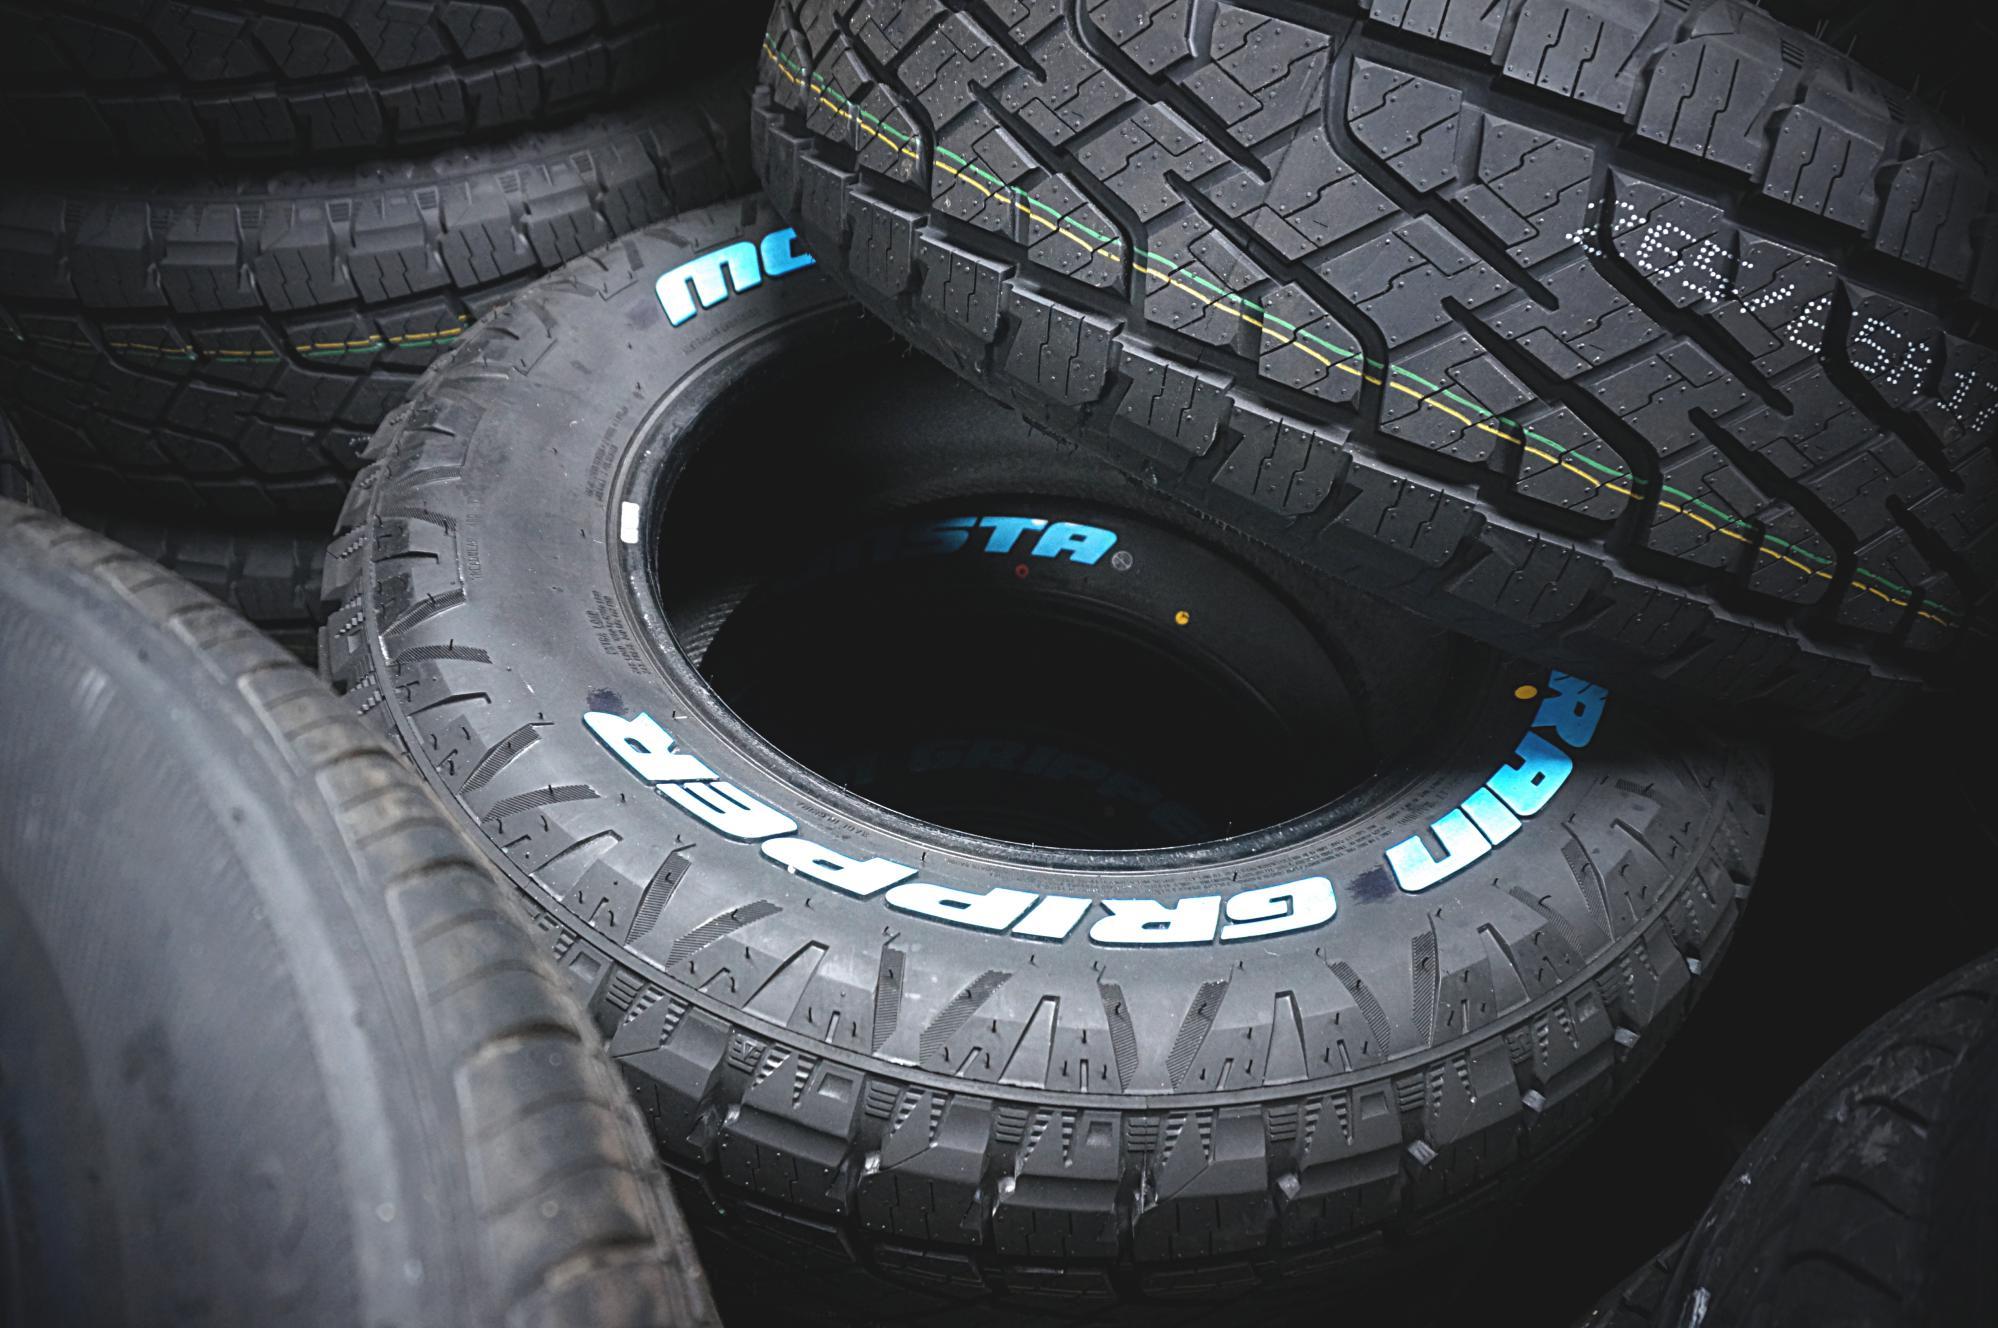 discount tyres parramtta